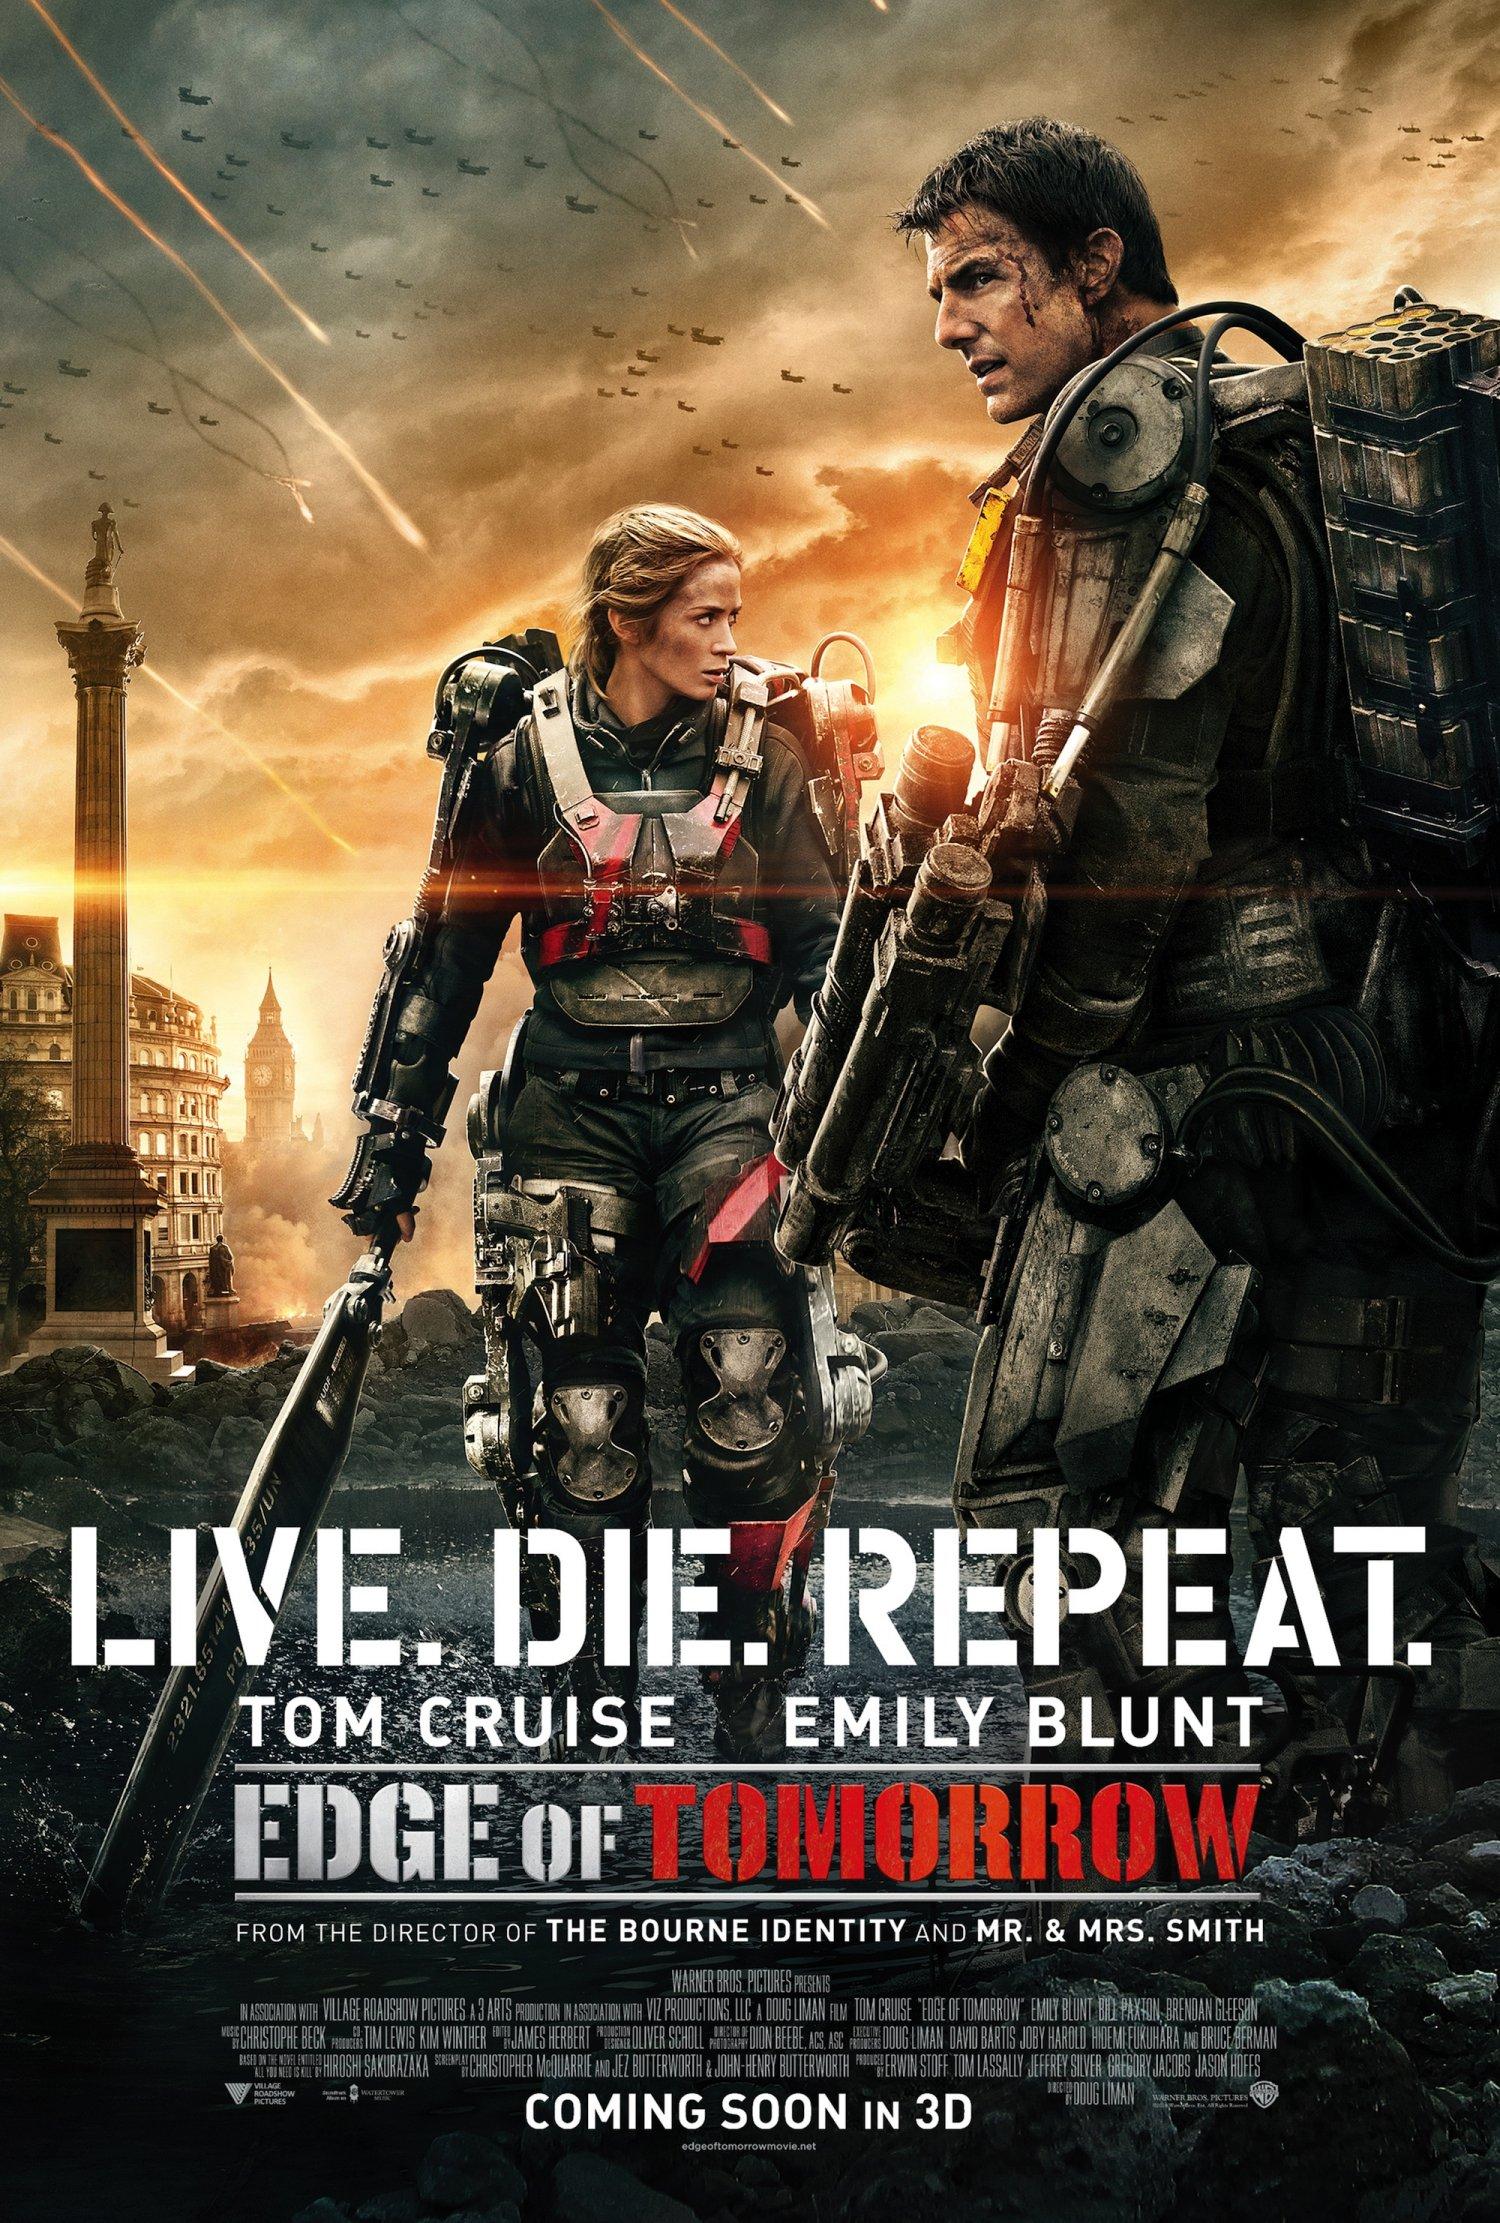 Edge of Tomorrow London poster